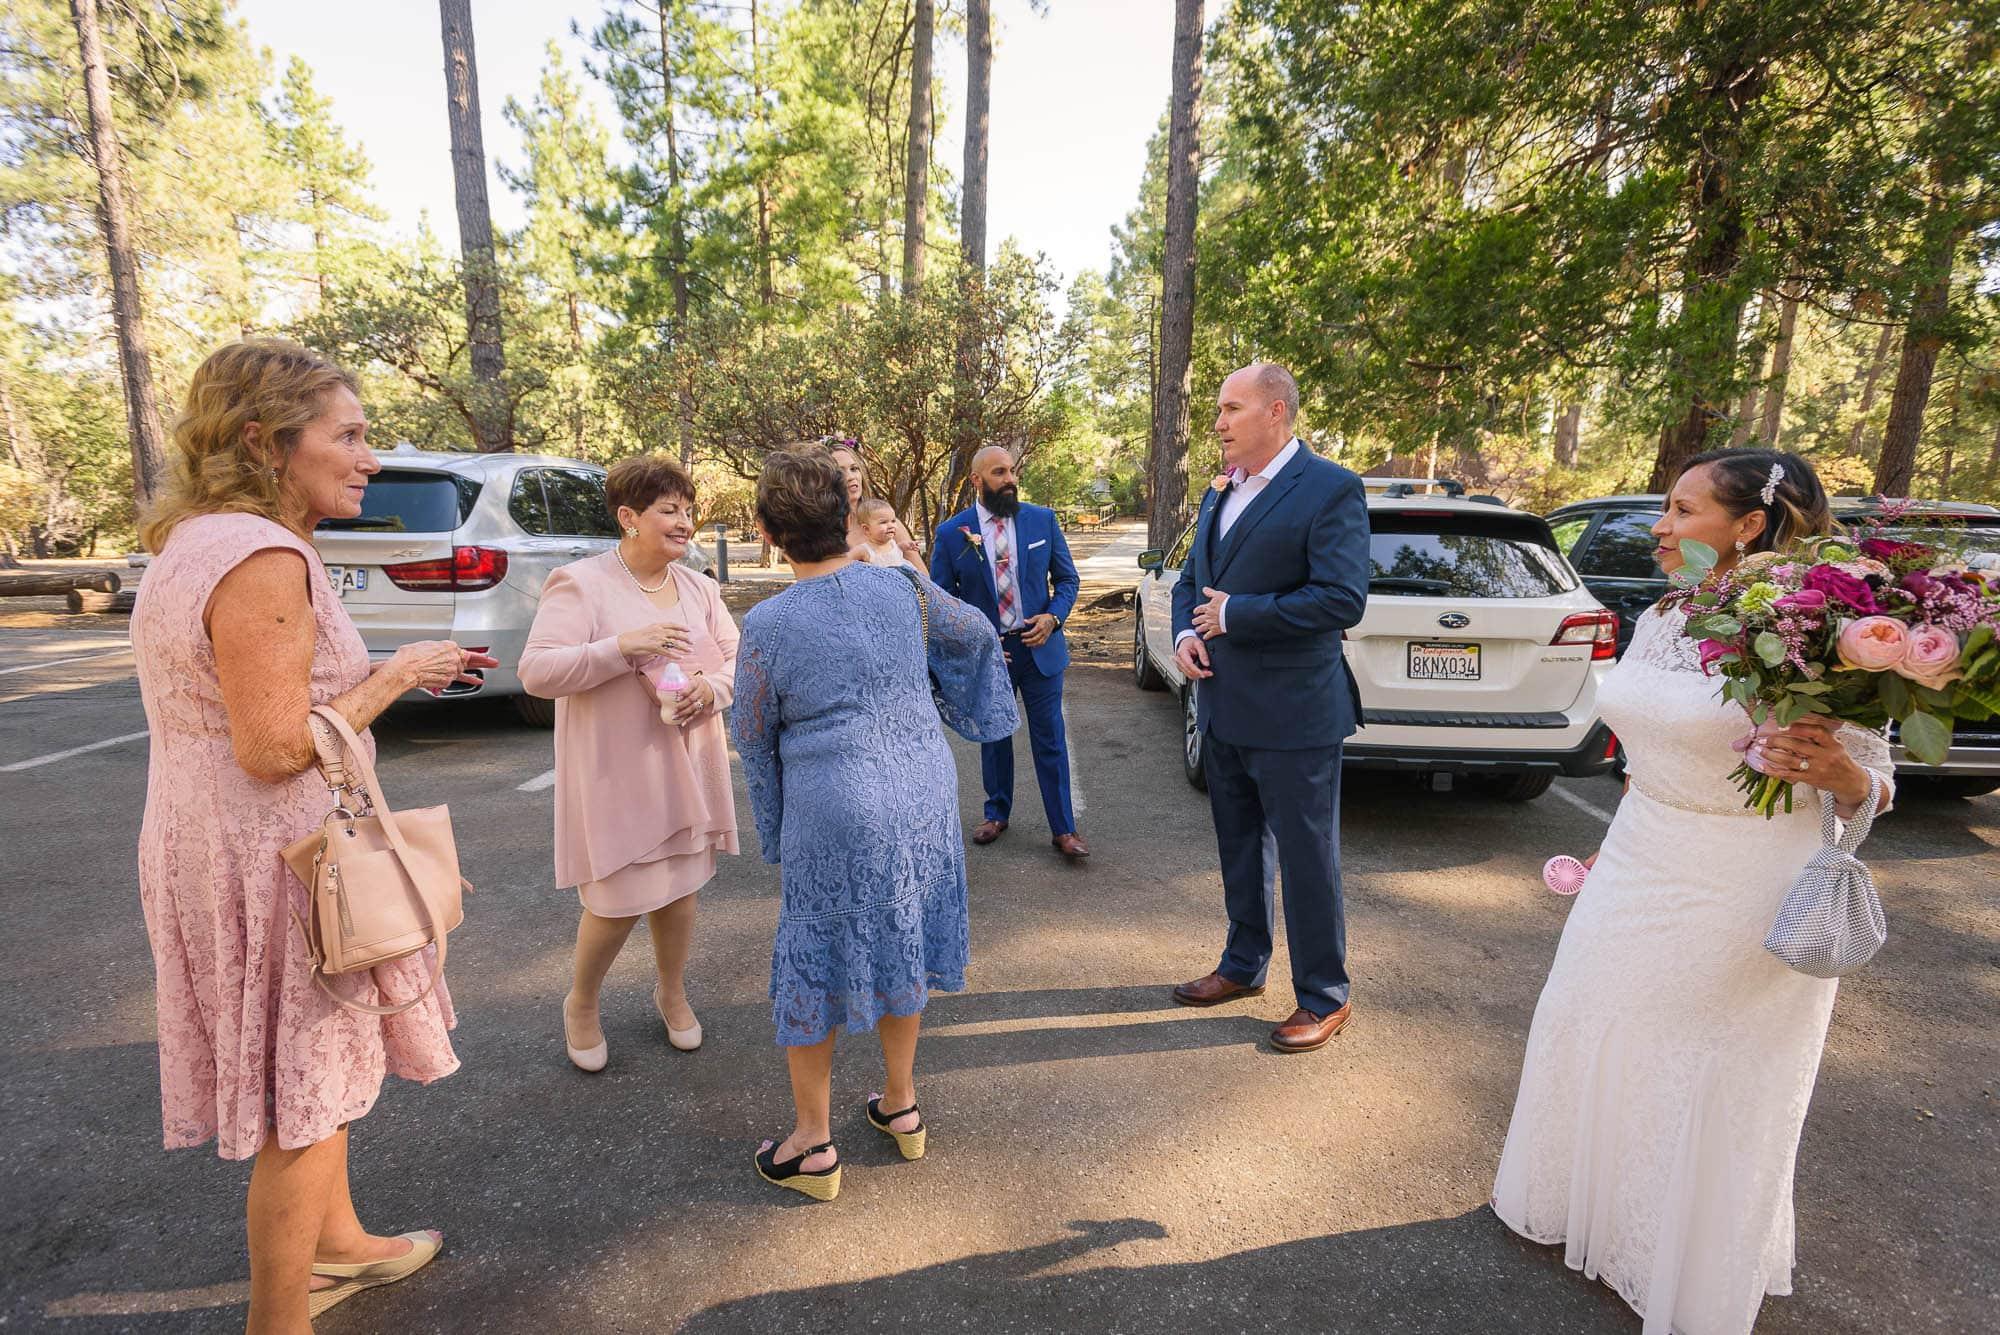 007_Alan_and_Heidi_Wedding_Jackie_Dannon